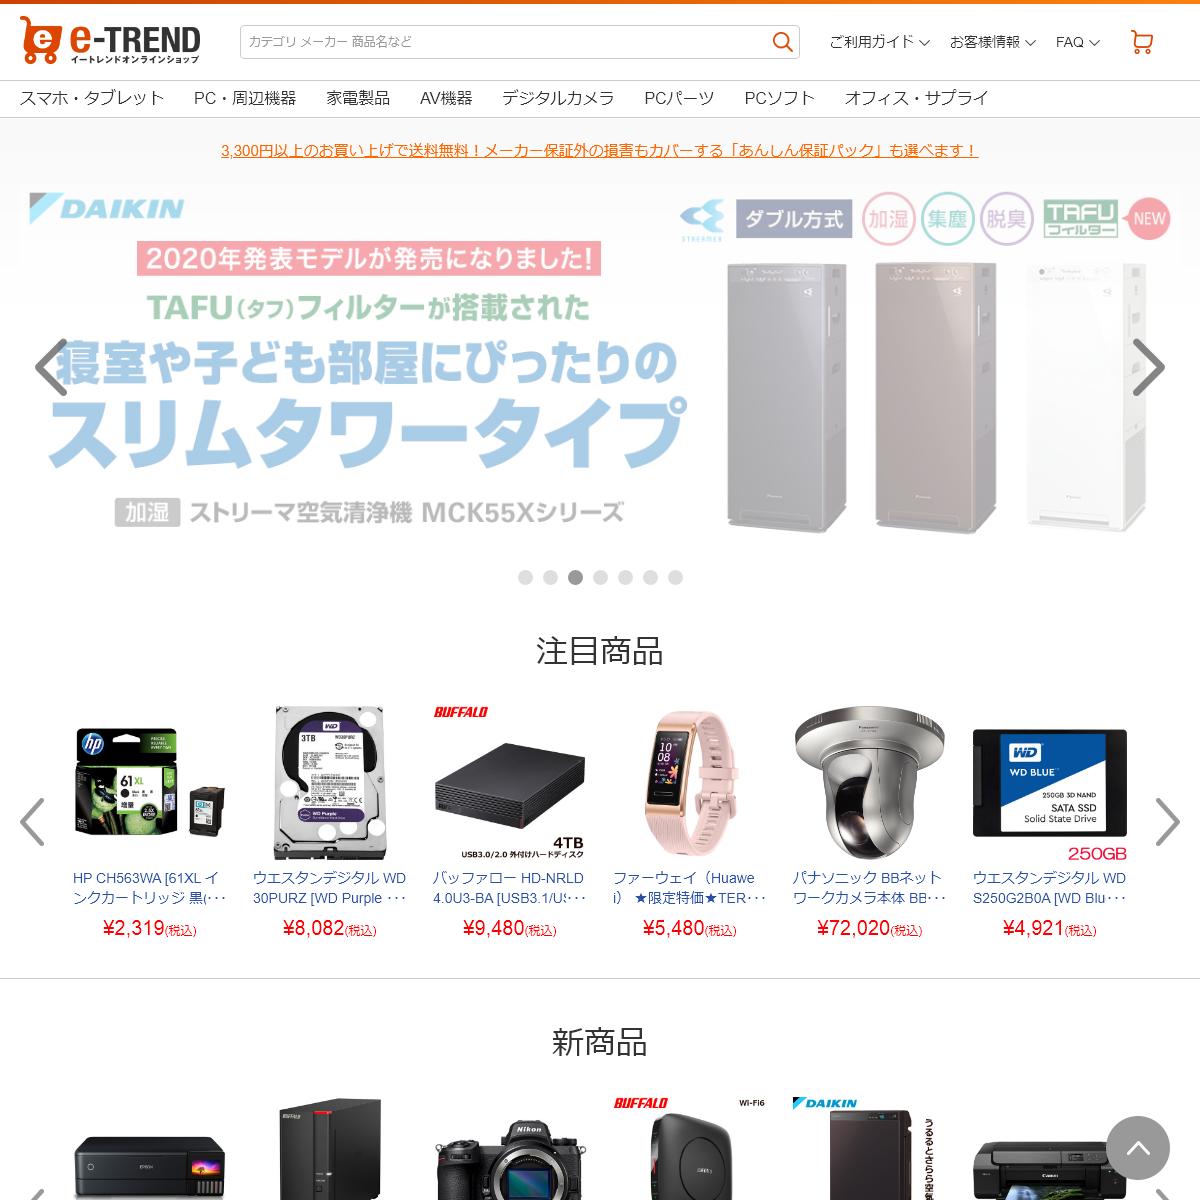 e-TREND - #より良い商品 #より良いサービス #お求めやすい価格